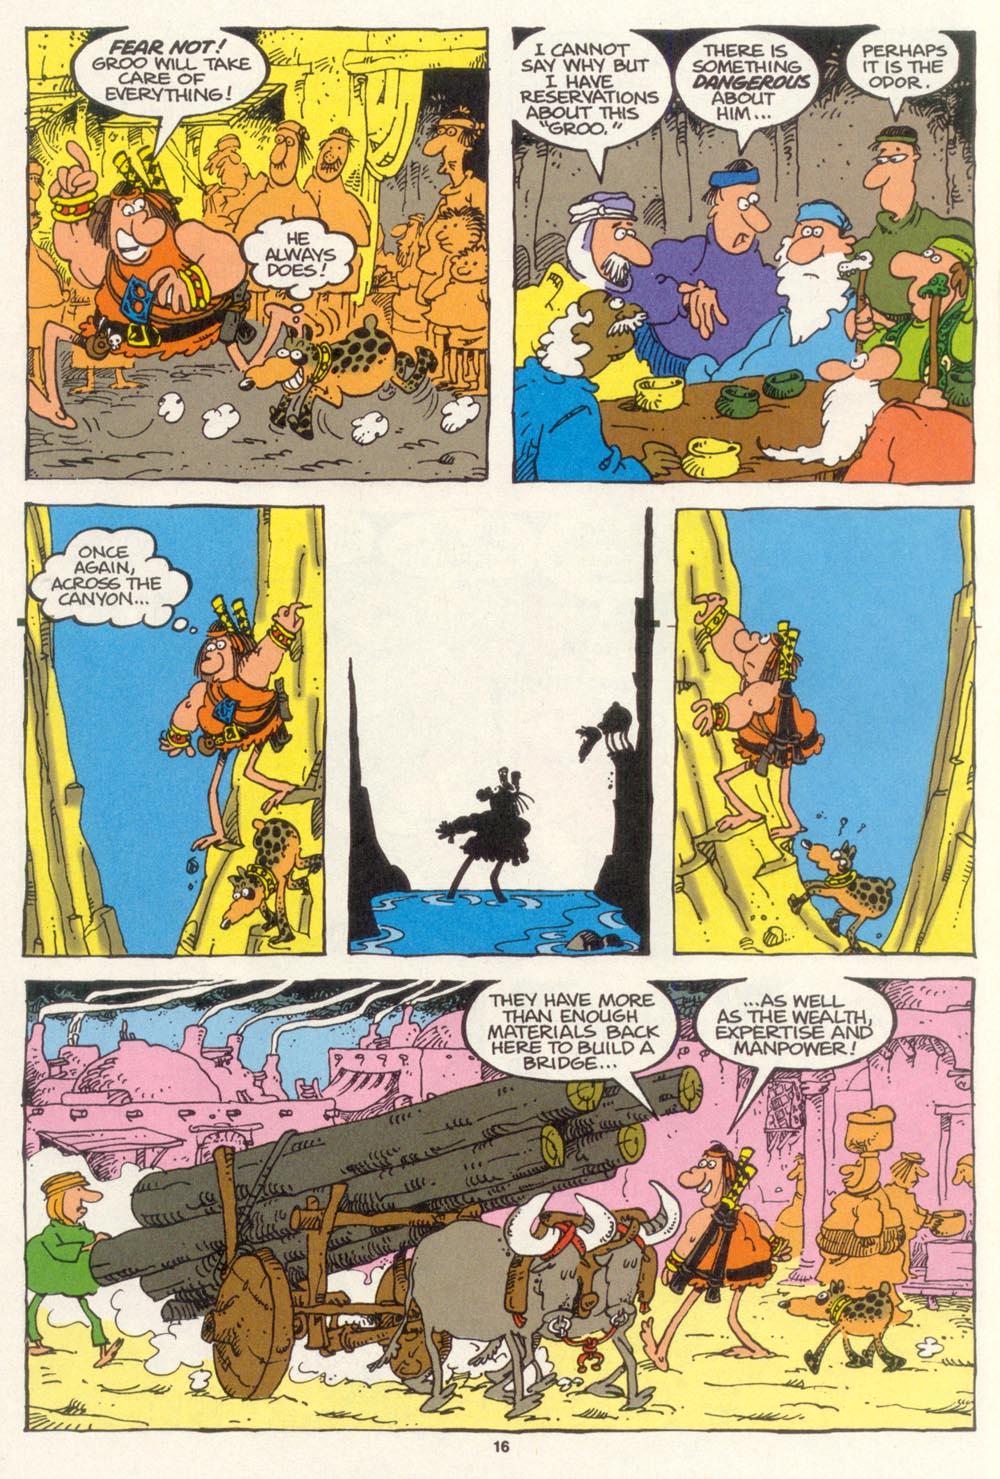 Read online Sergio Aragonés Groo the Wanderer comic -  Issue #102 - 18